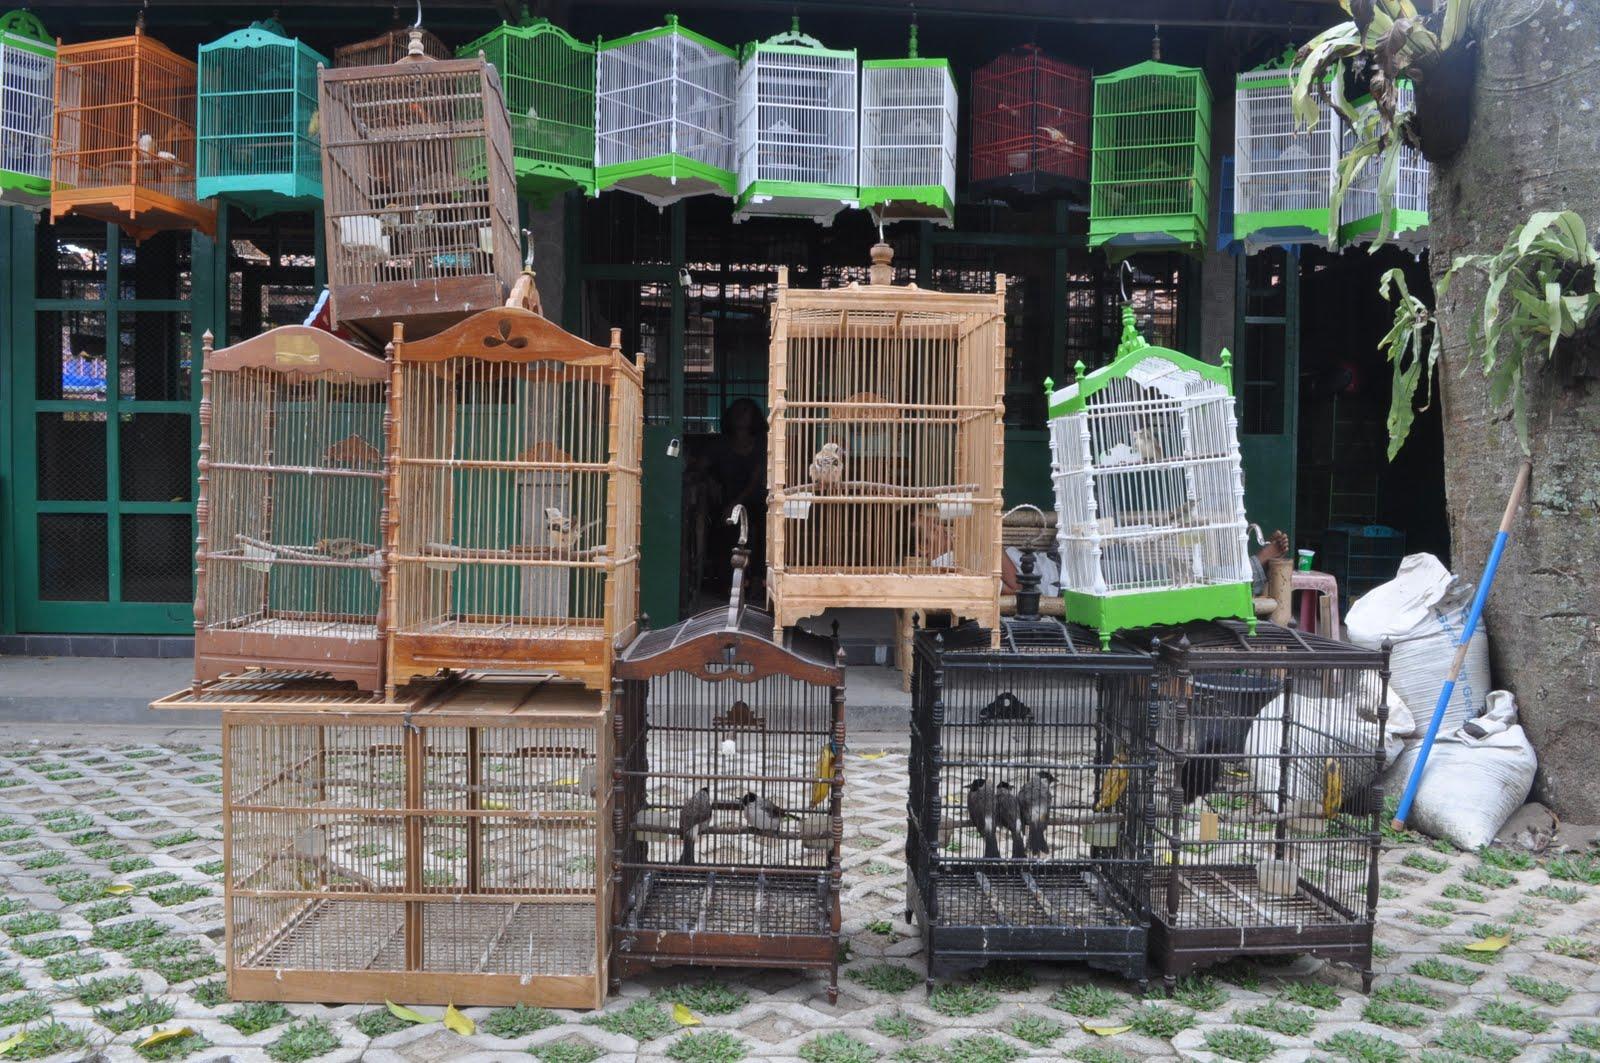 Marché aux oiseaux à Yogyakarta